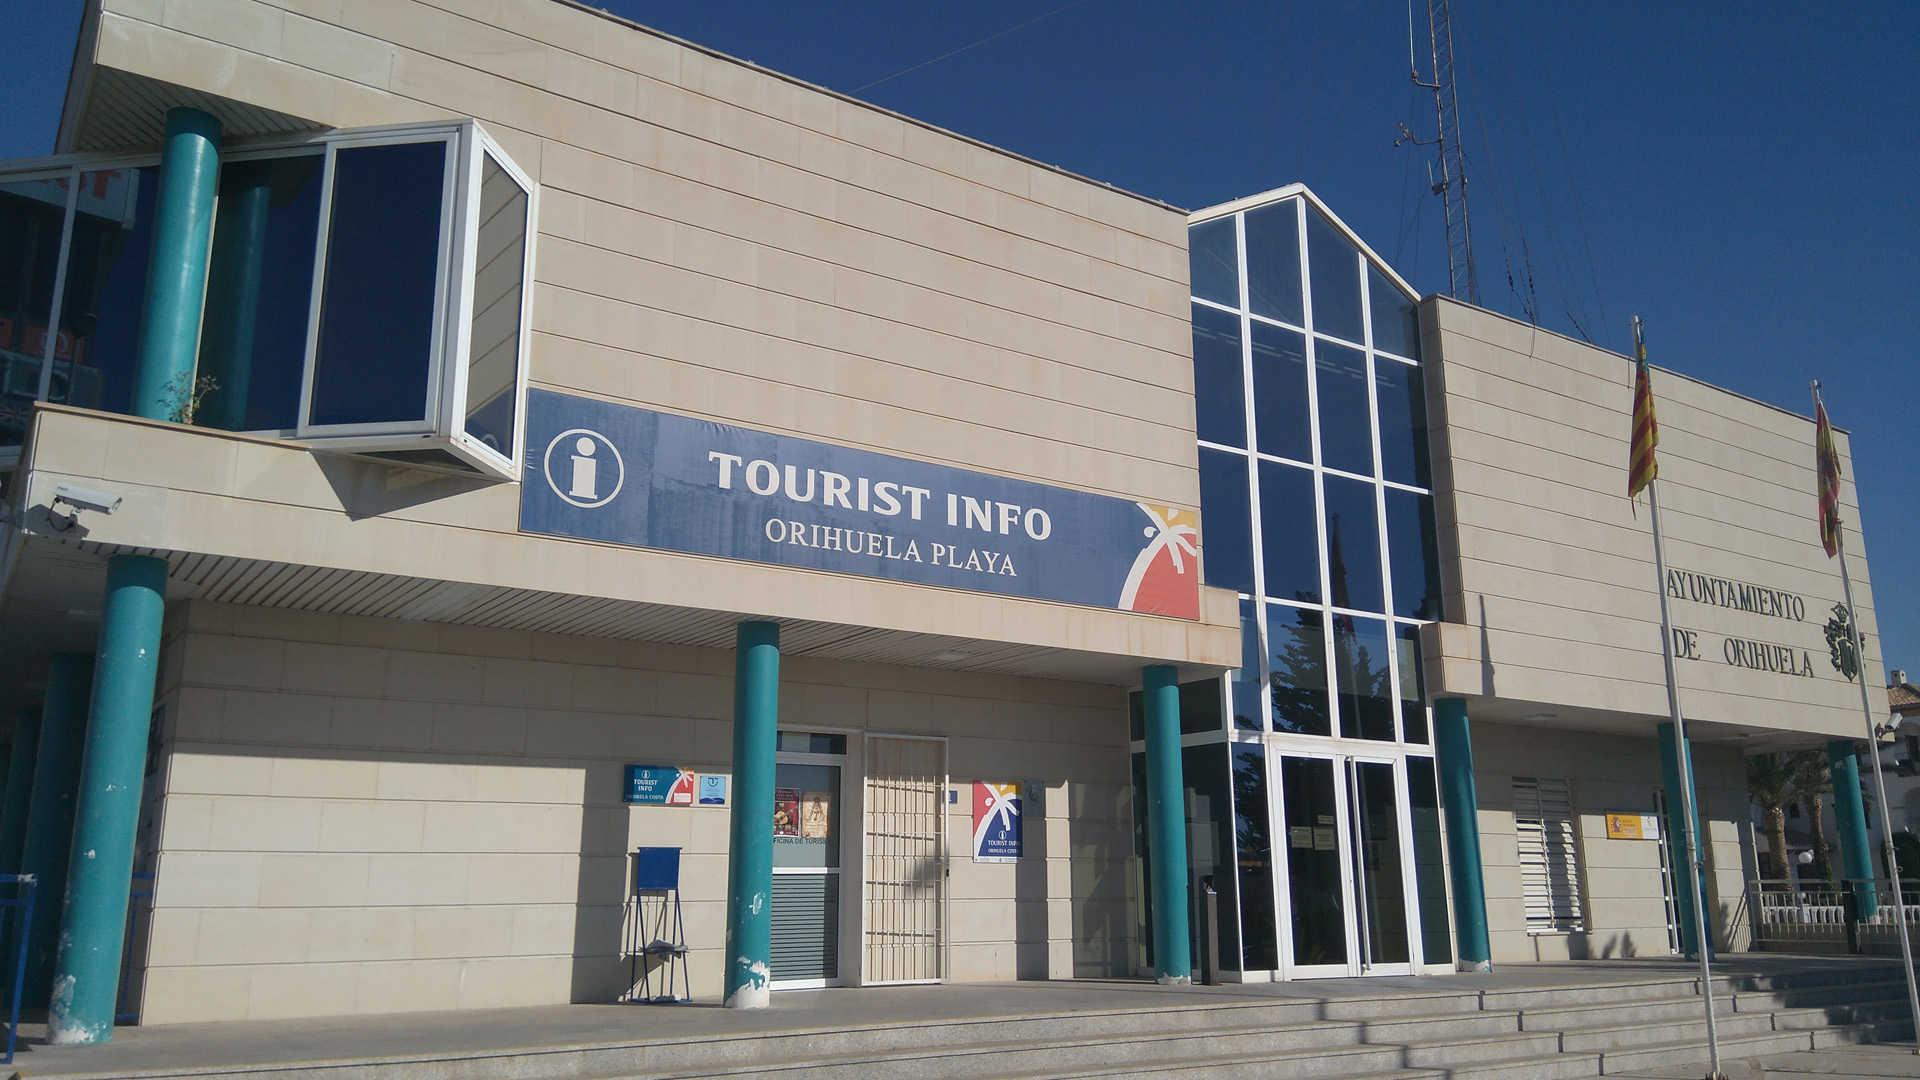 TOURIST INFO ORIHUELA - PLAYA